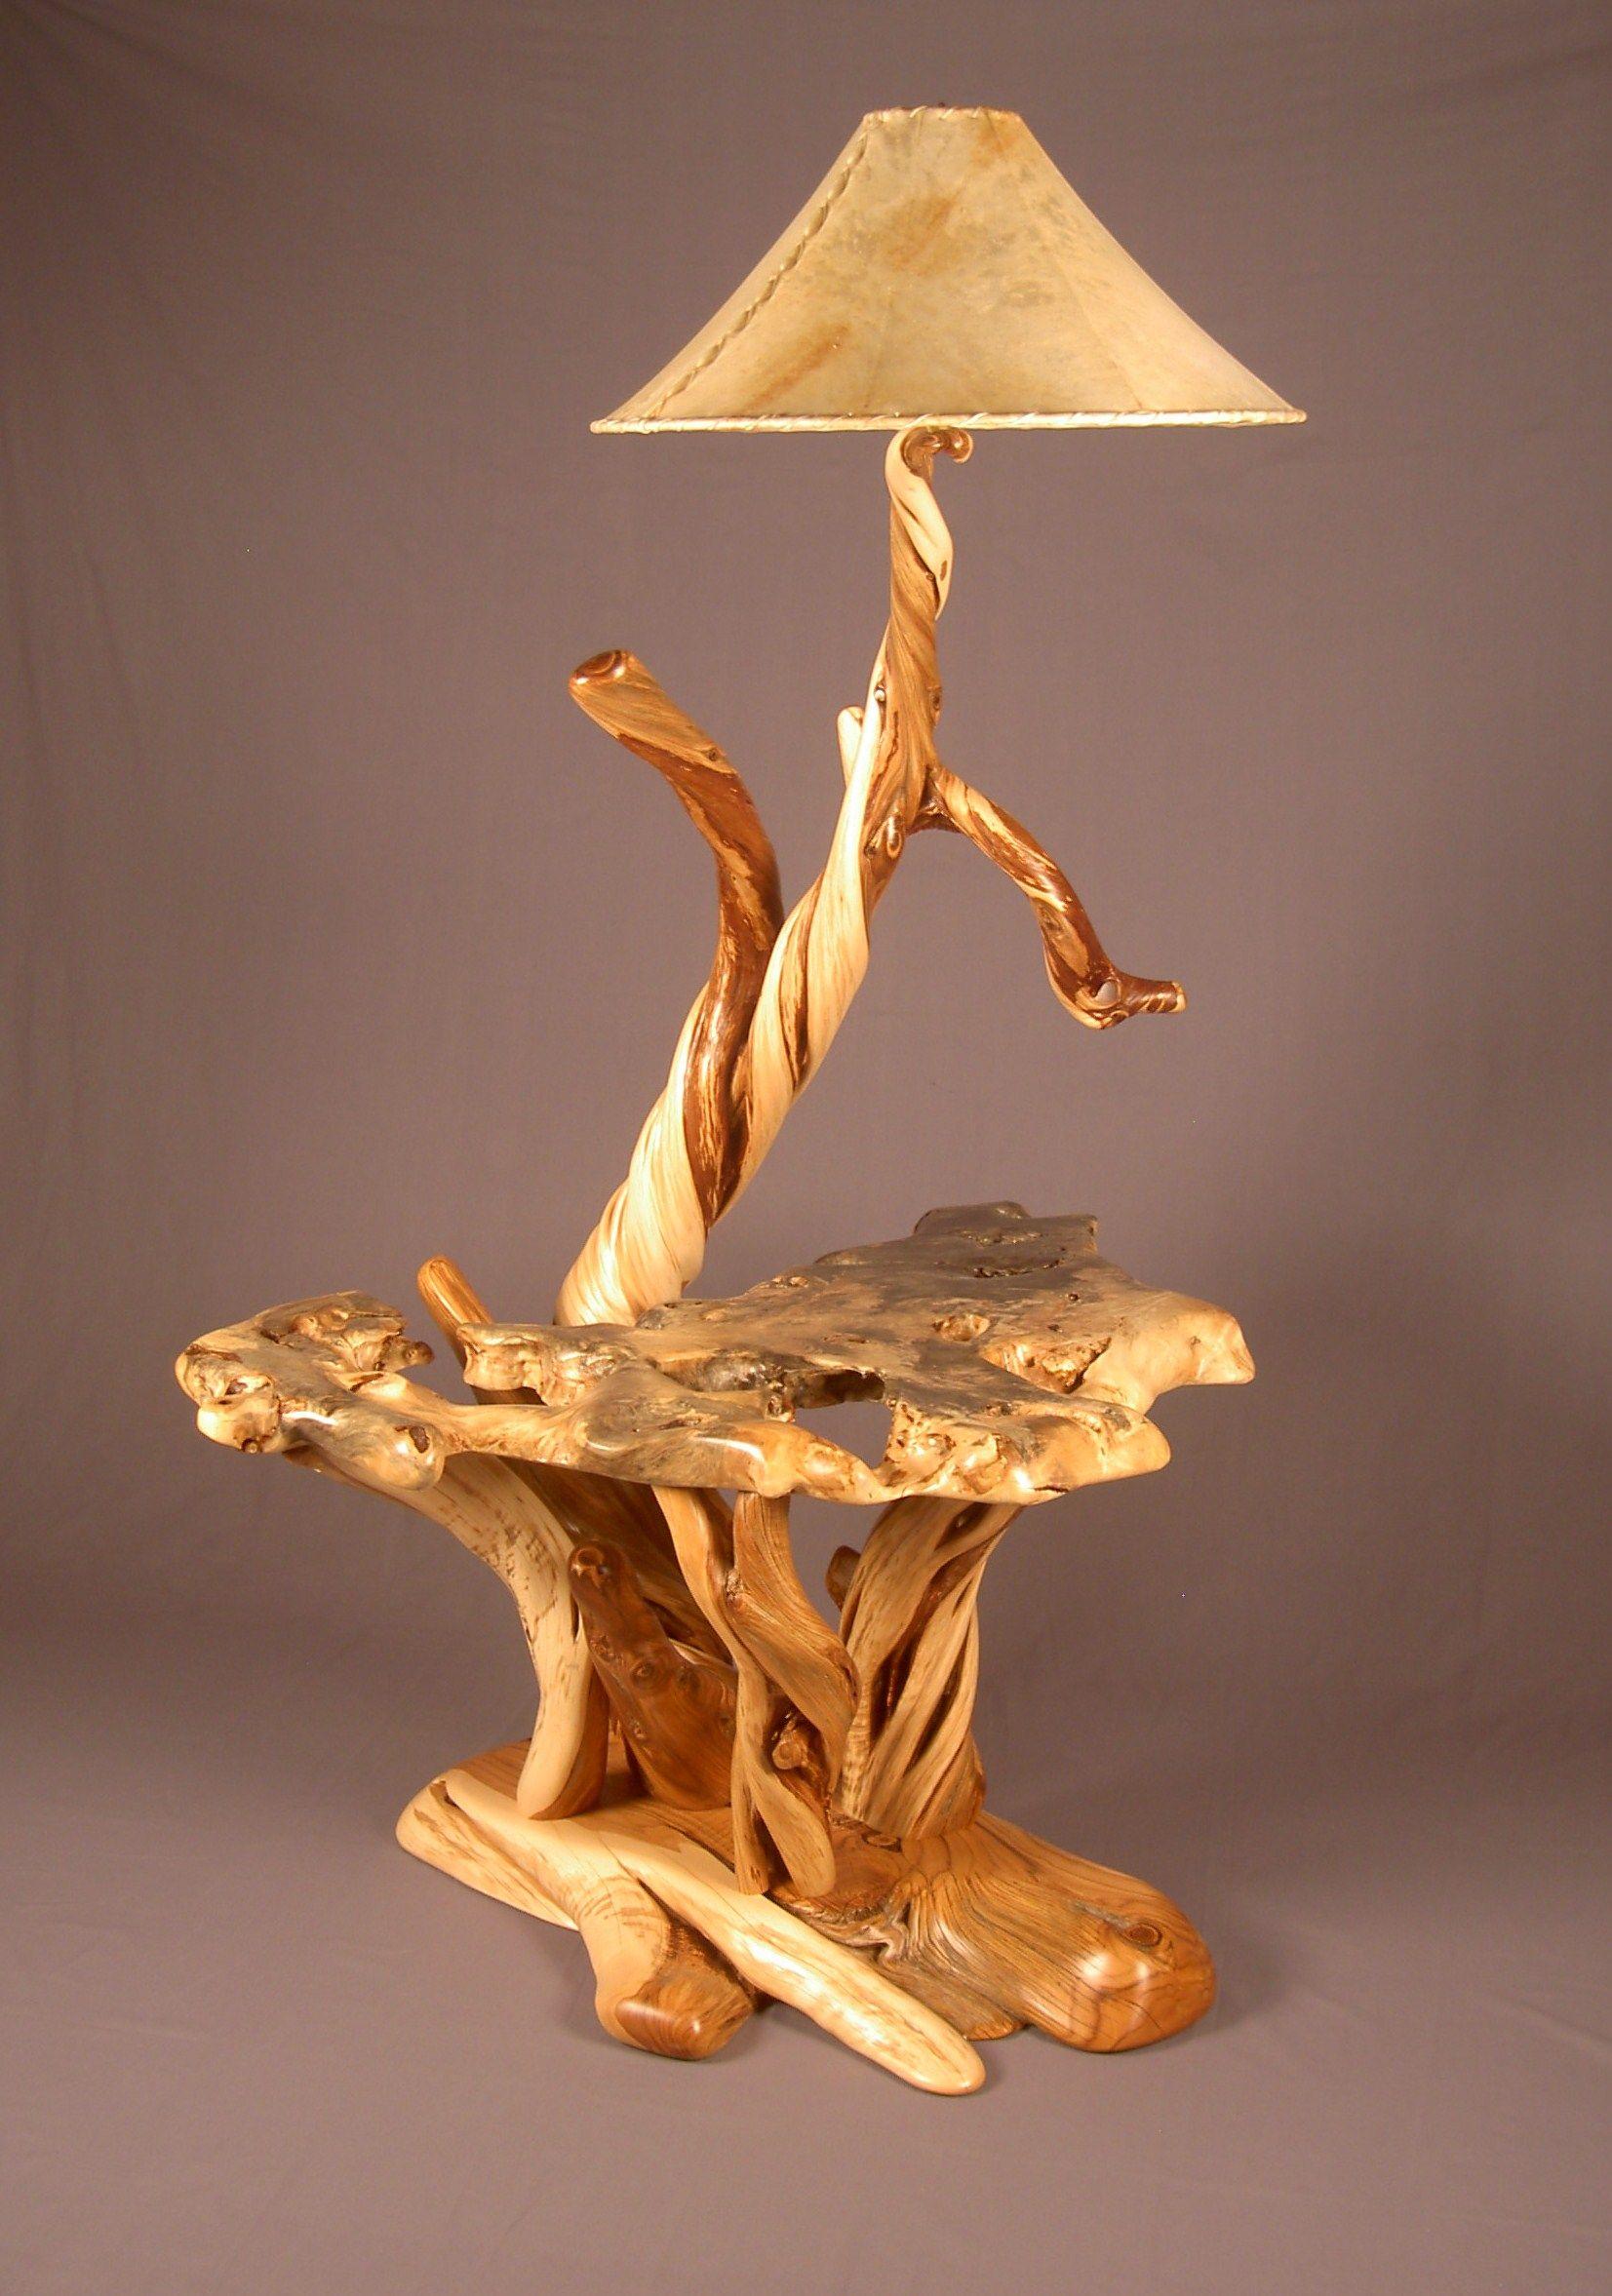 Rustic Burl Wood Bedroom Furniture: Juniper Floor Lamp With Buckeye Burl